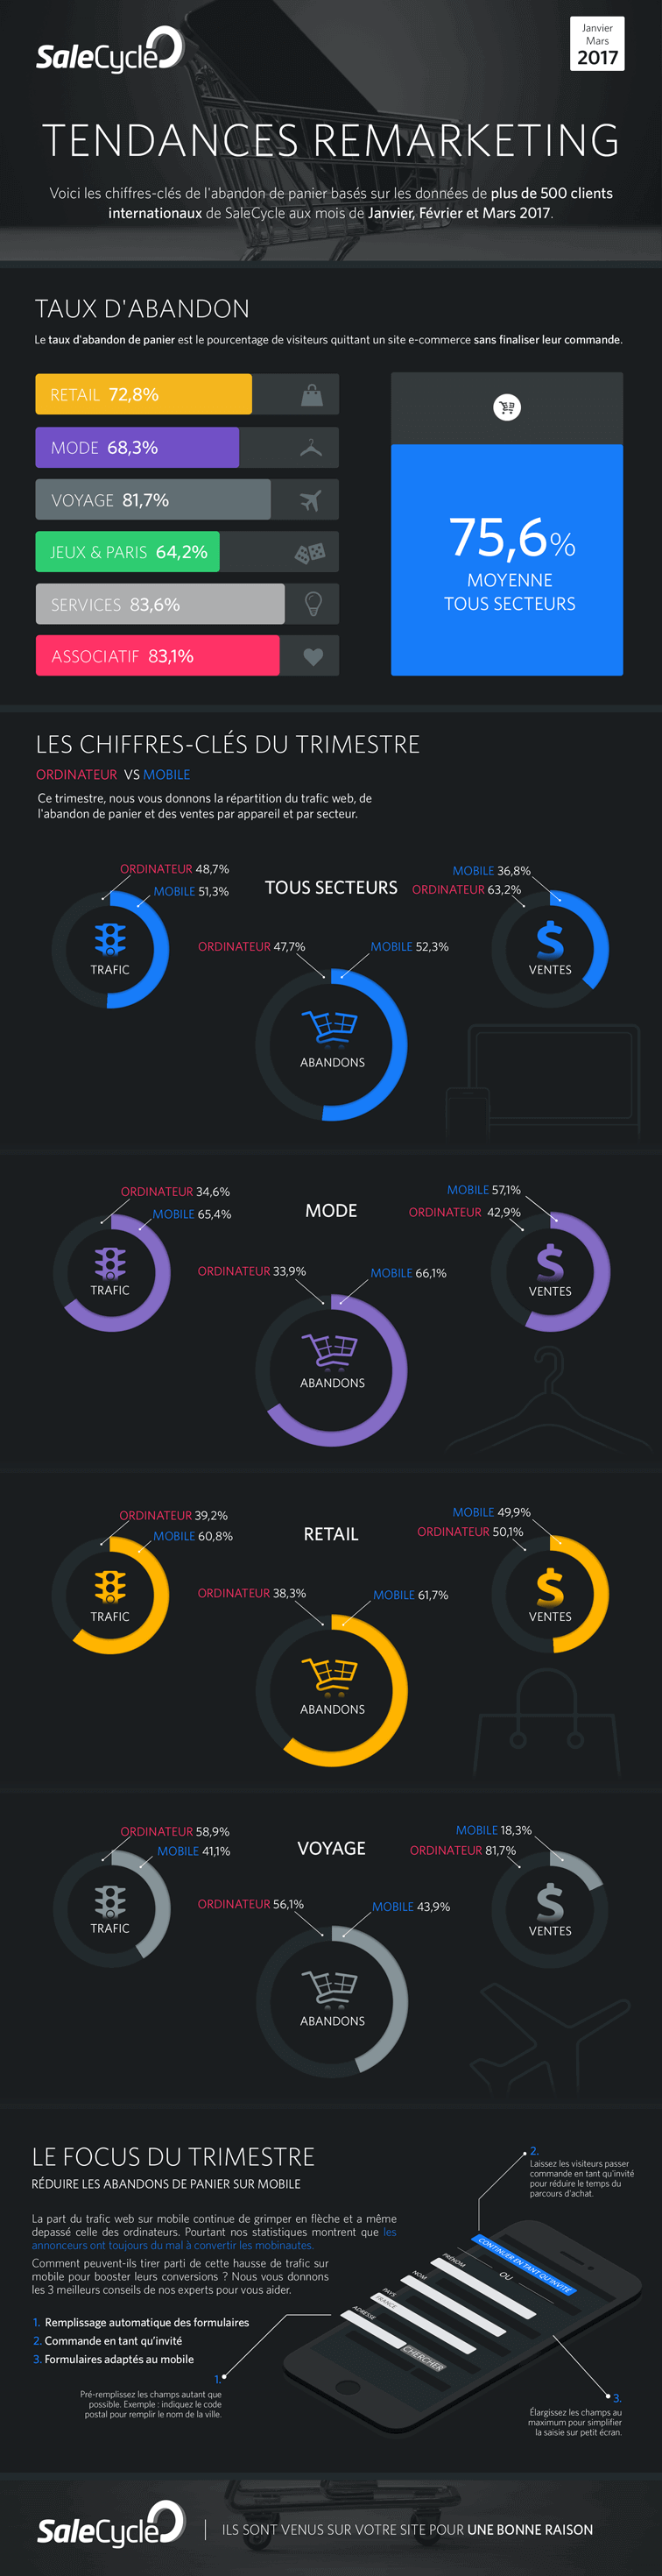 Infographie 1er trimestre 2017